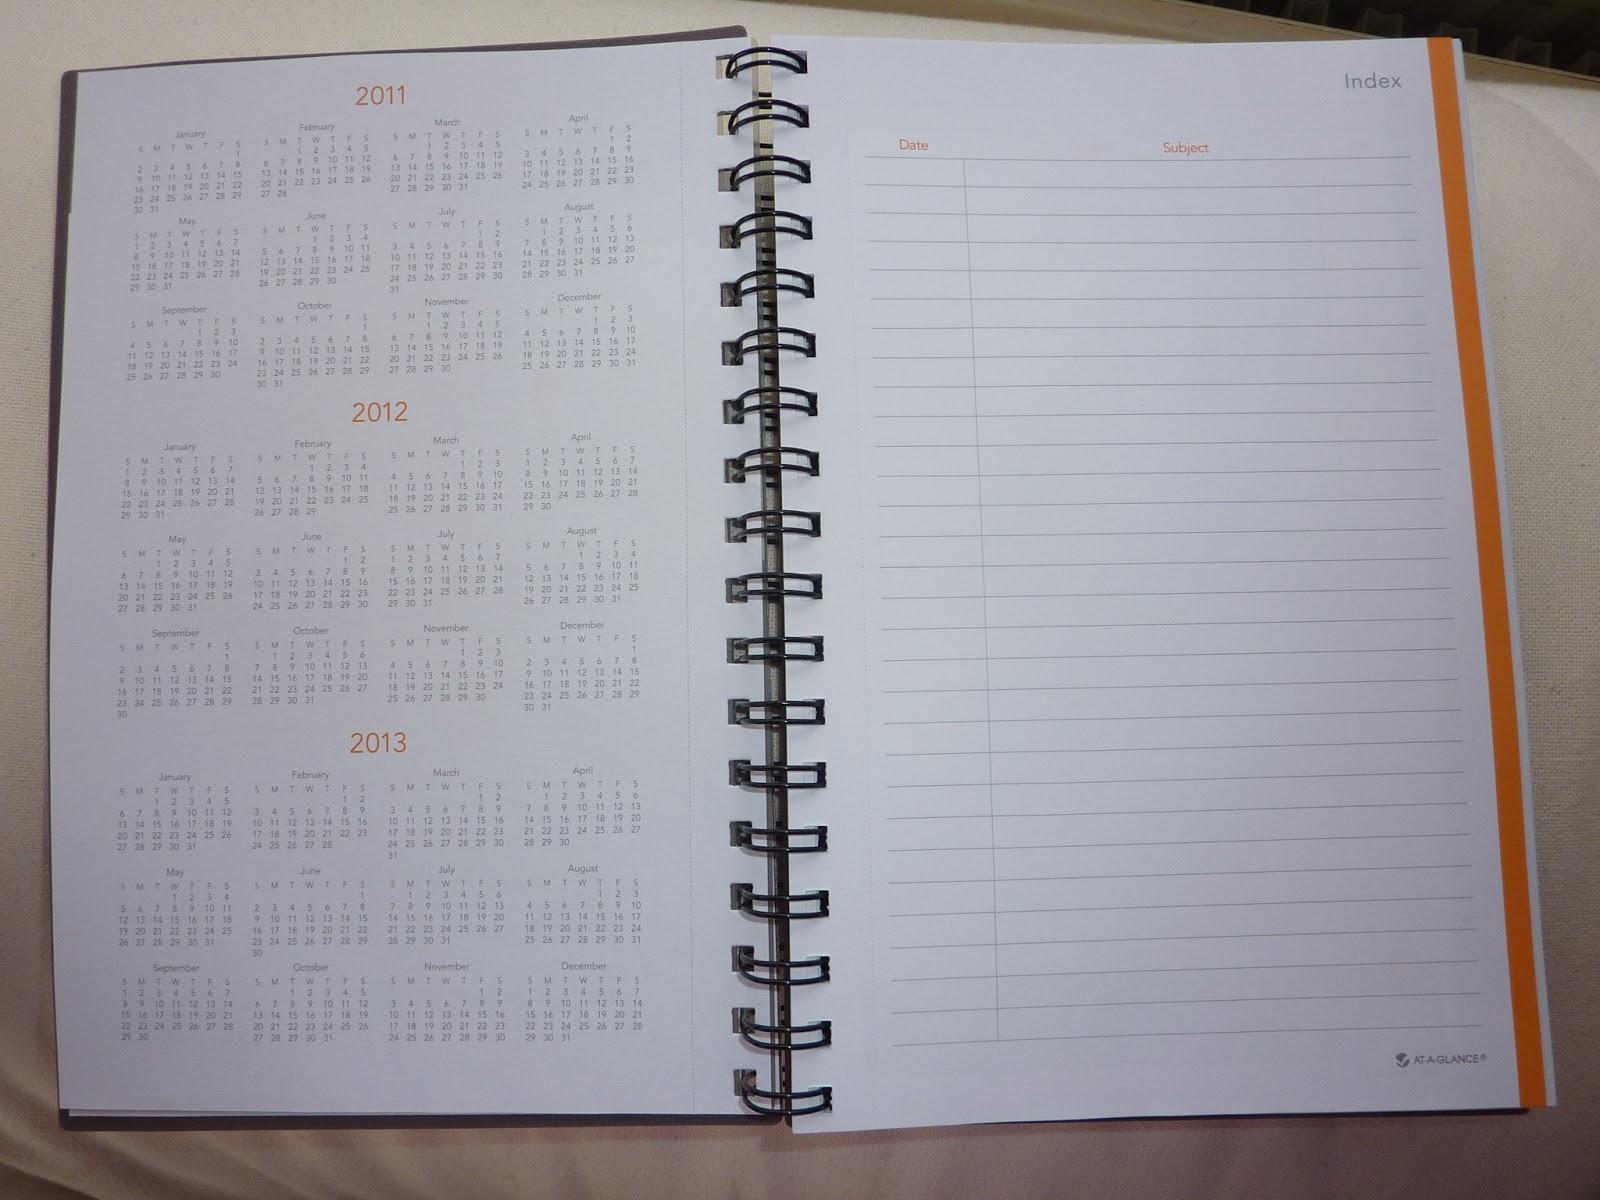 Calendar Planner Notebook : Plannerisms at a glance planning notebooks